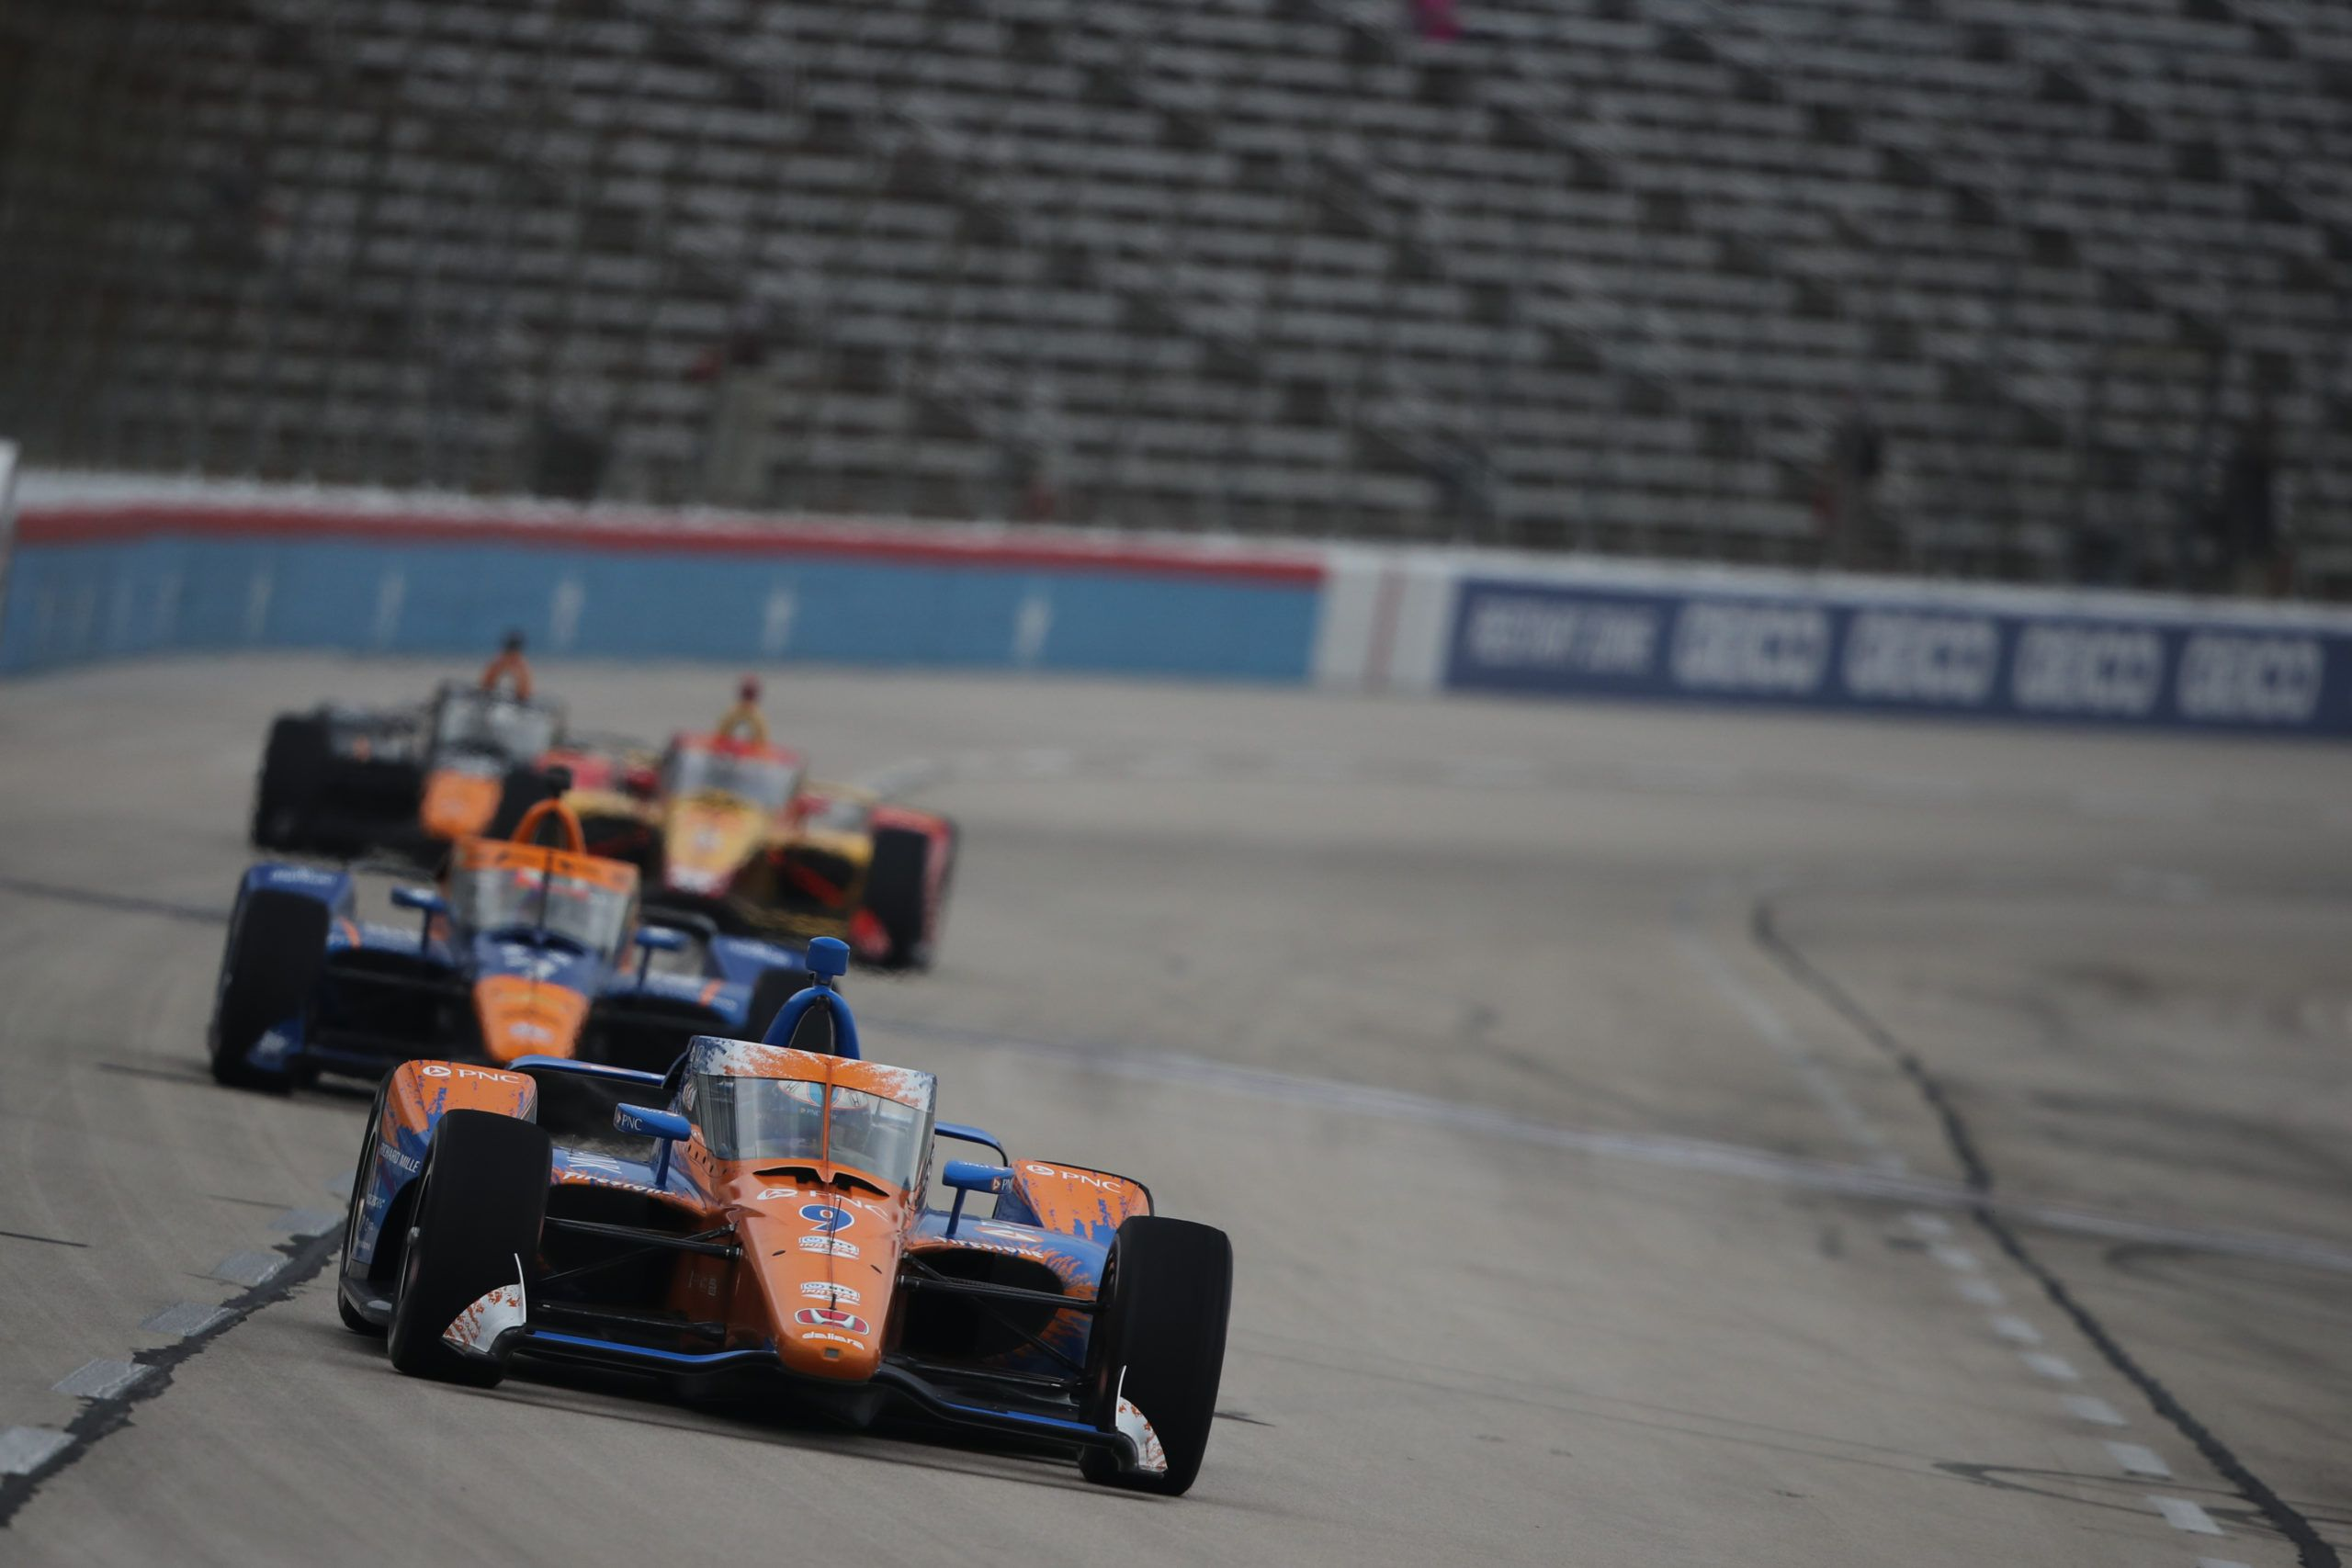 Scott Dixon, CGR, IndyCar 2021, Scott McLaughlin, Team Penske